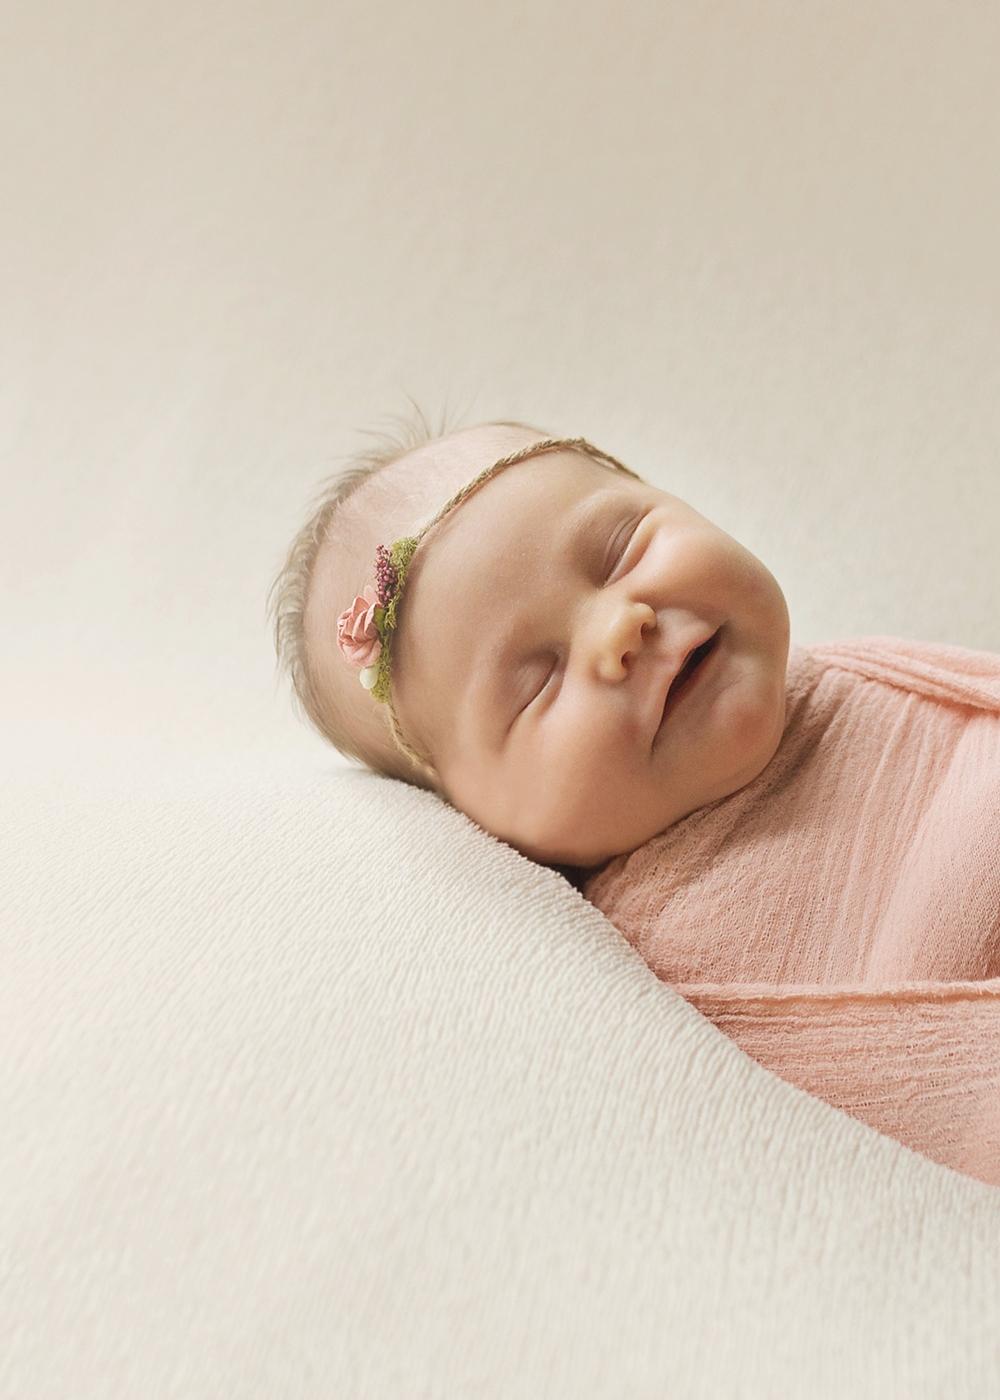 Edmonton Newborn Photographer_Baby Lauren Sneak Peek 8.jpg